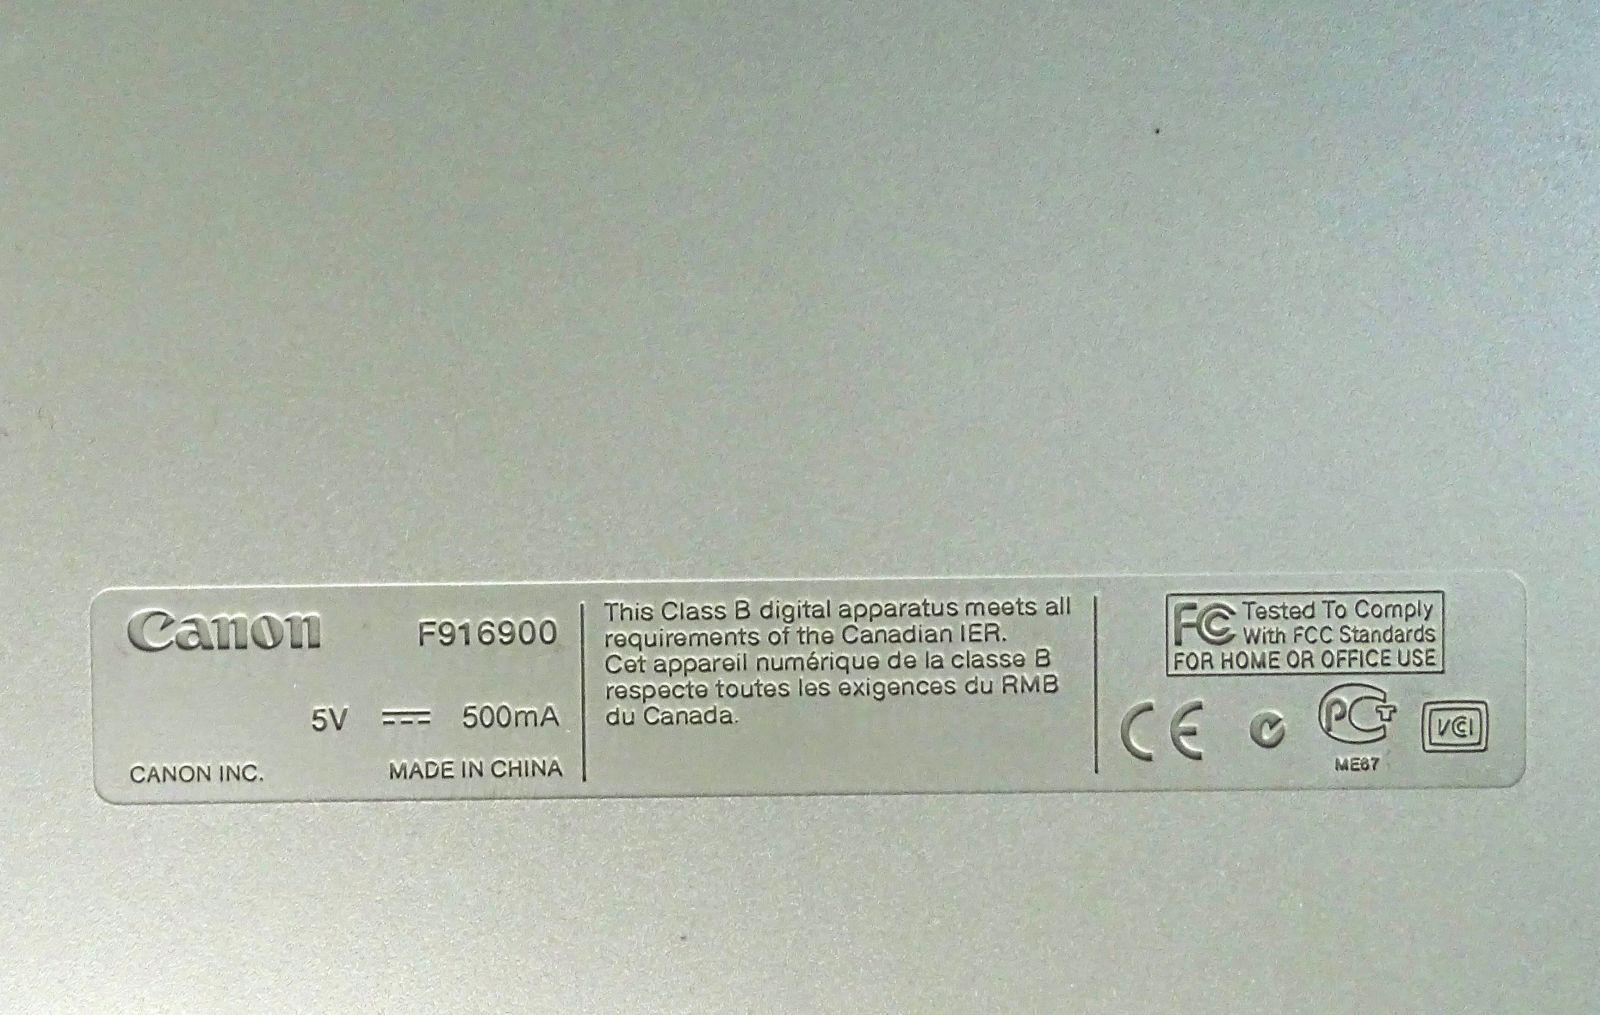 DSC00975.JPG (1600�1015)